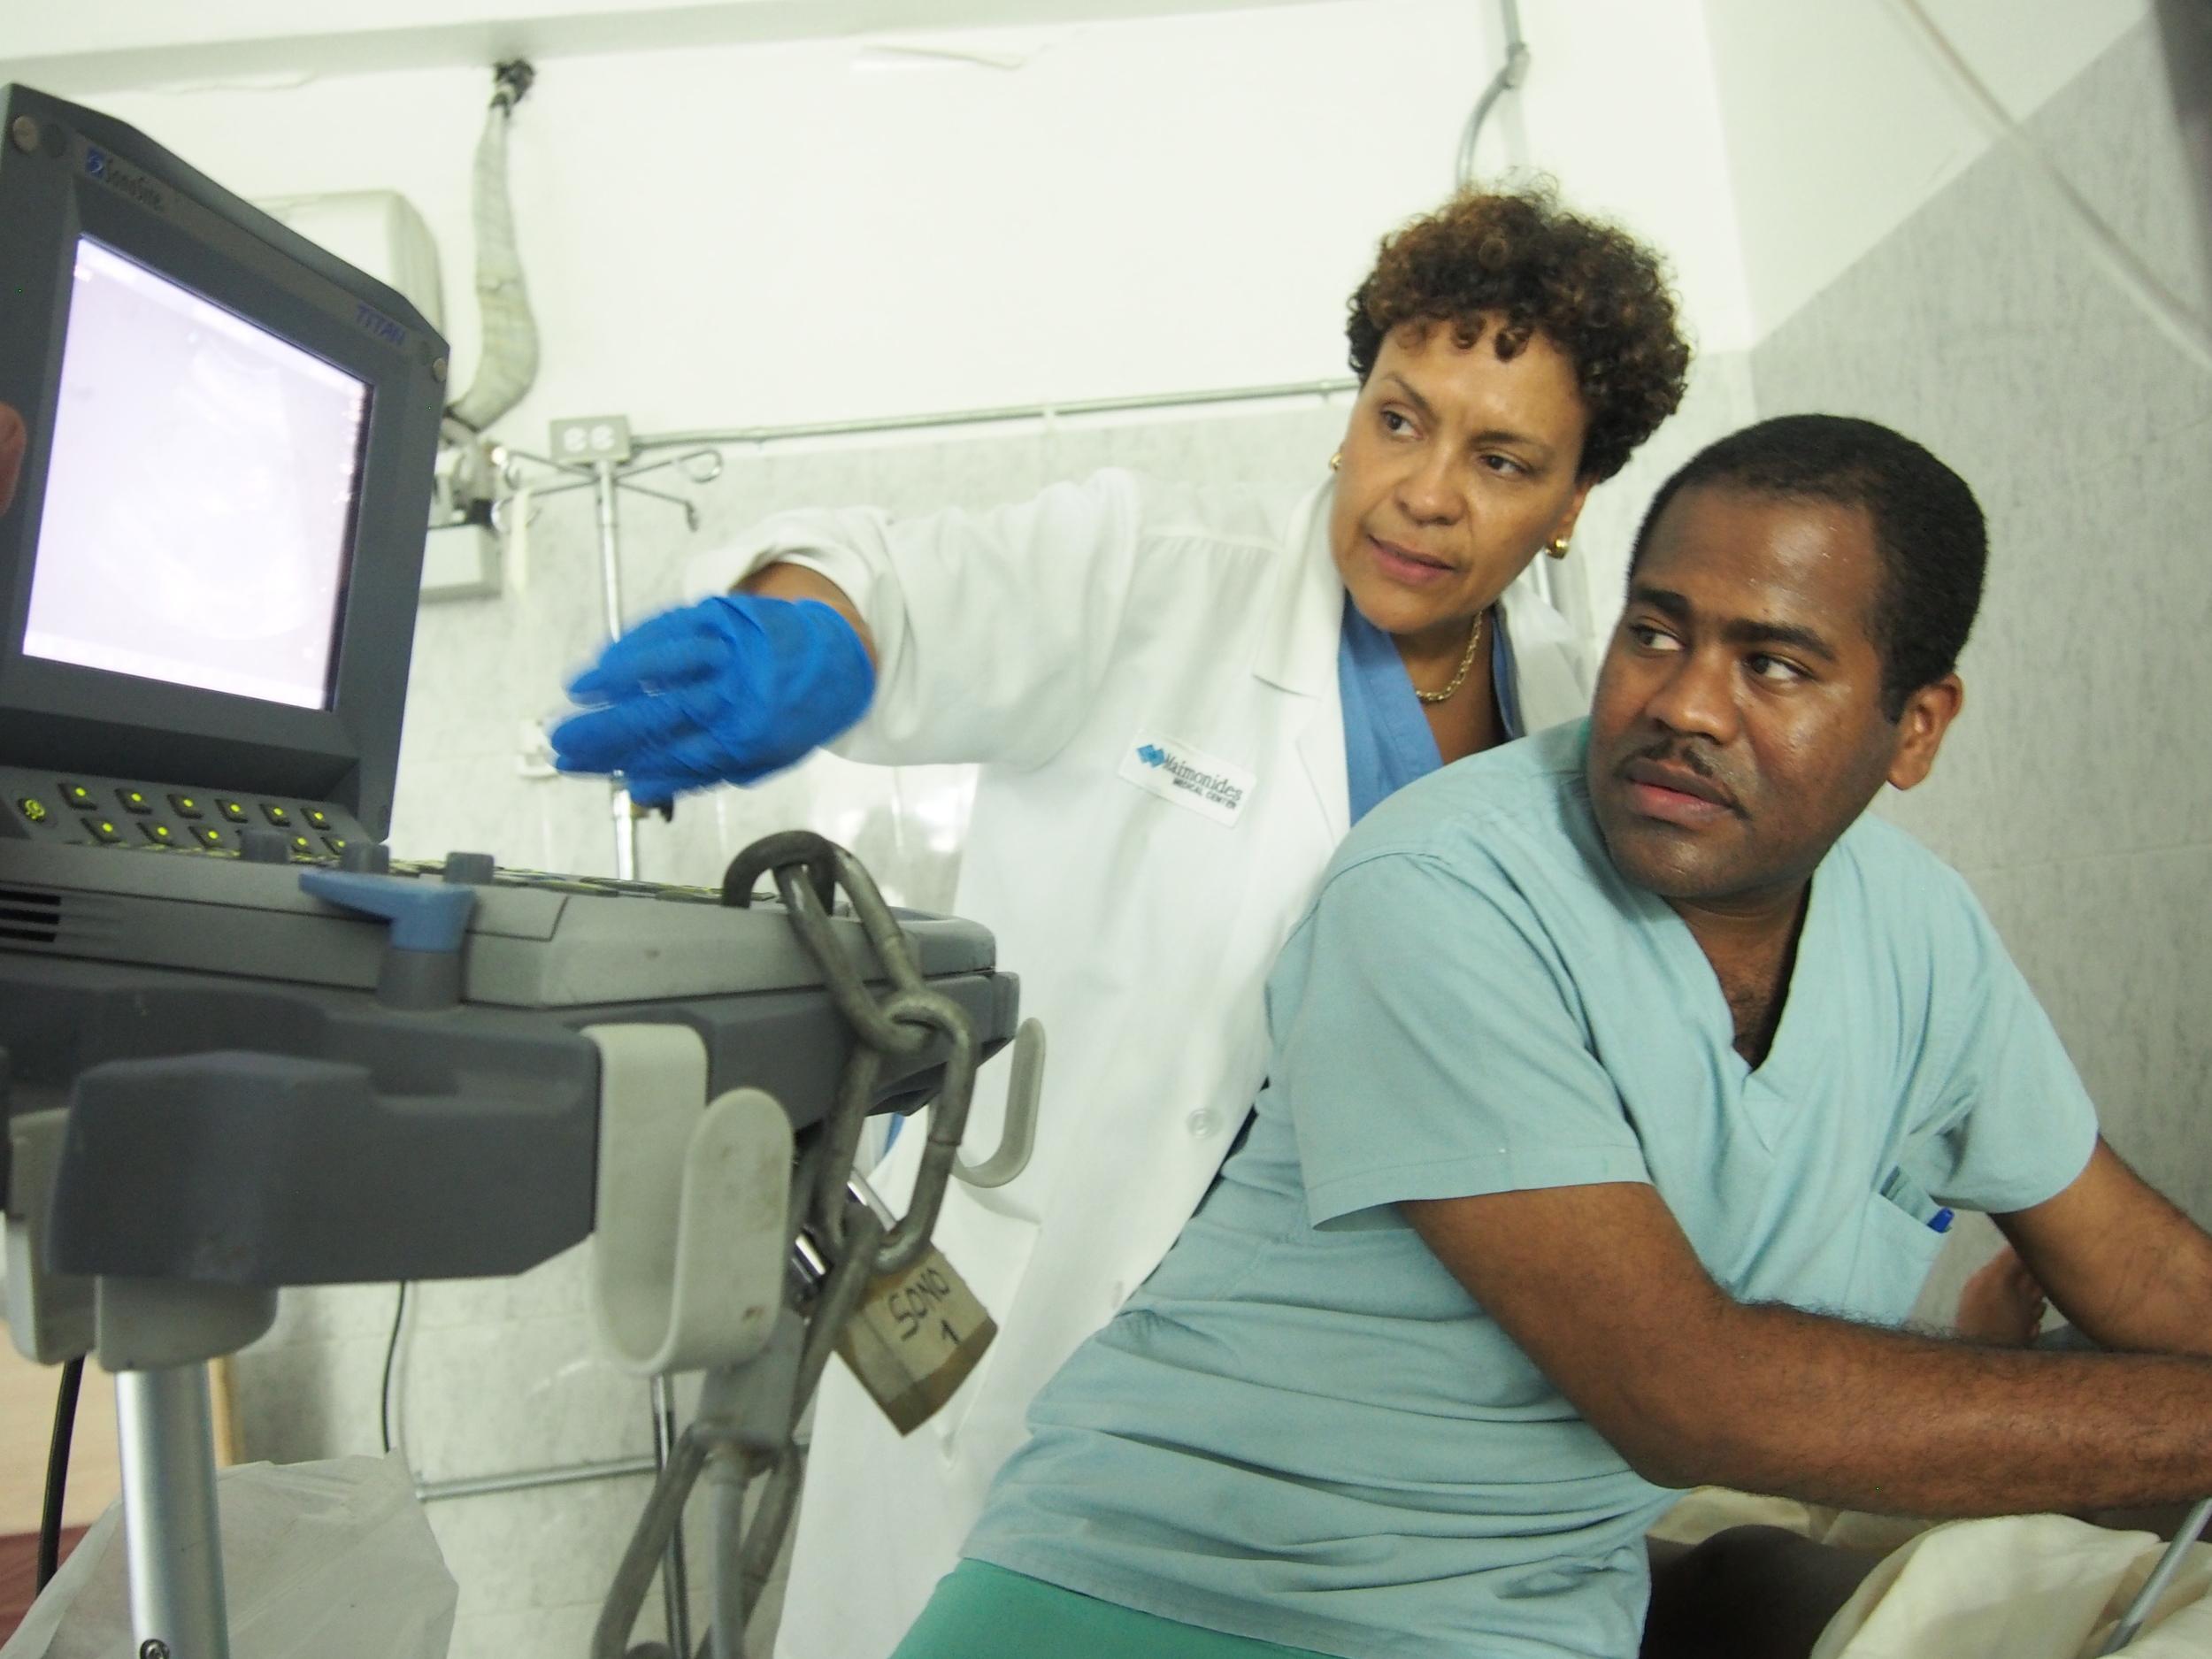 Haitian resident being guided through a high-risk OB ultrasound